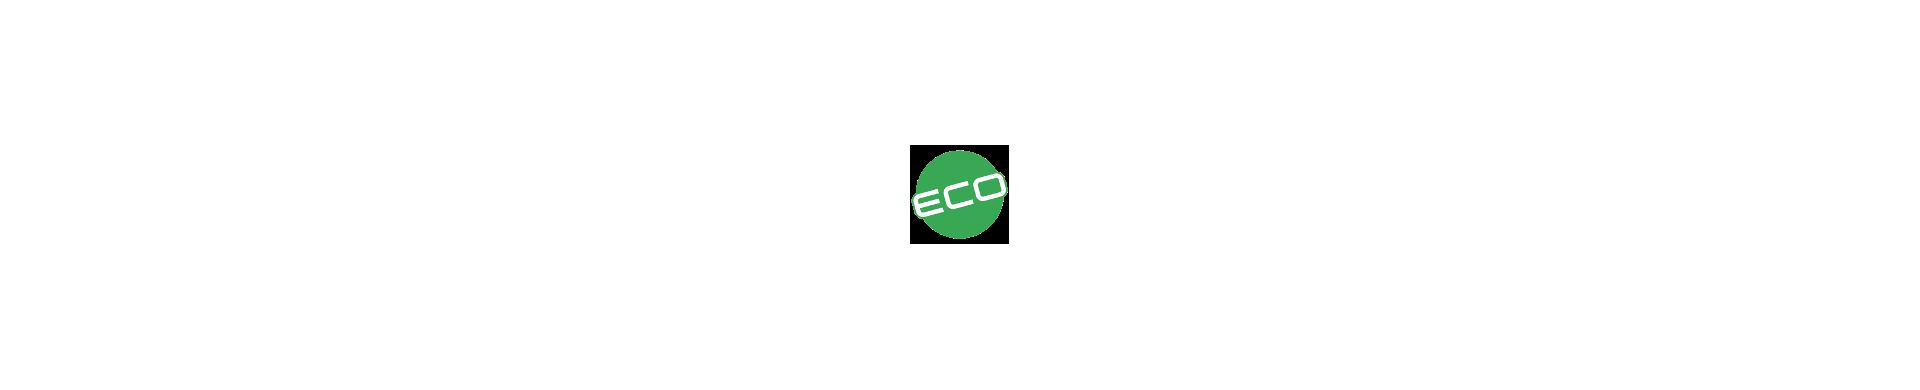 Abonos ecológicos - Comprar abonos ecológicos